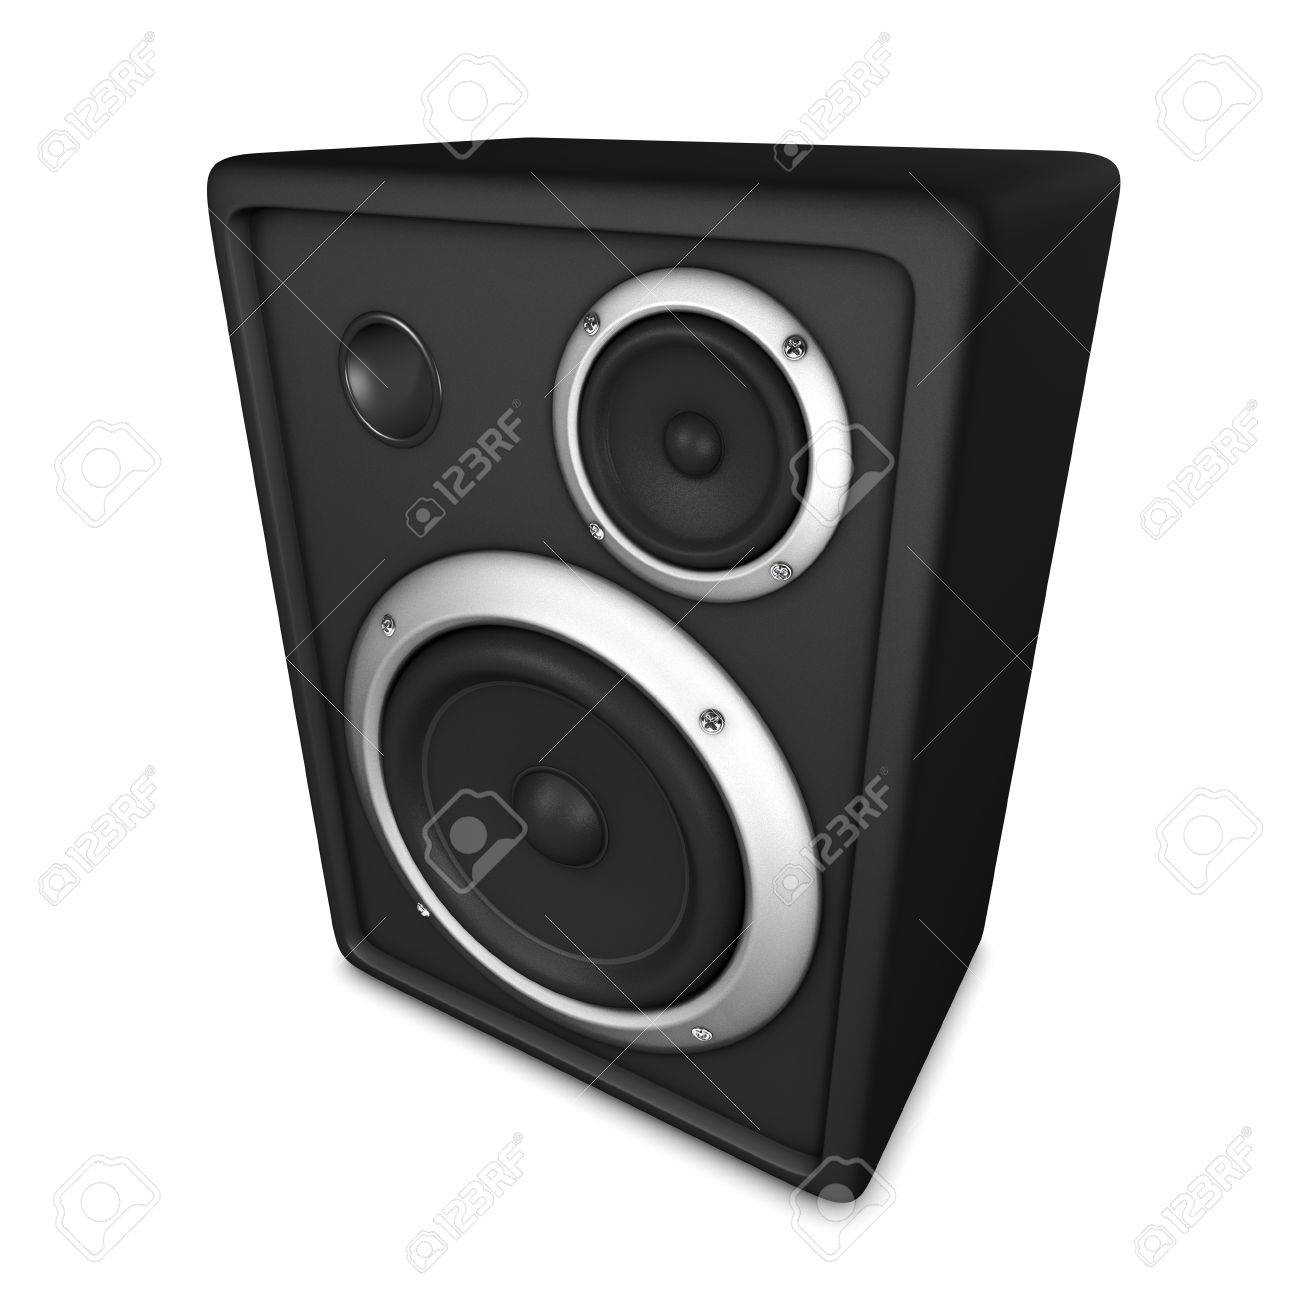 Audio Speaker Box, isolated on white Stock Photo - 22242873